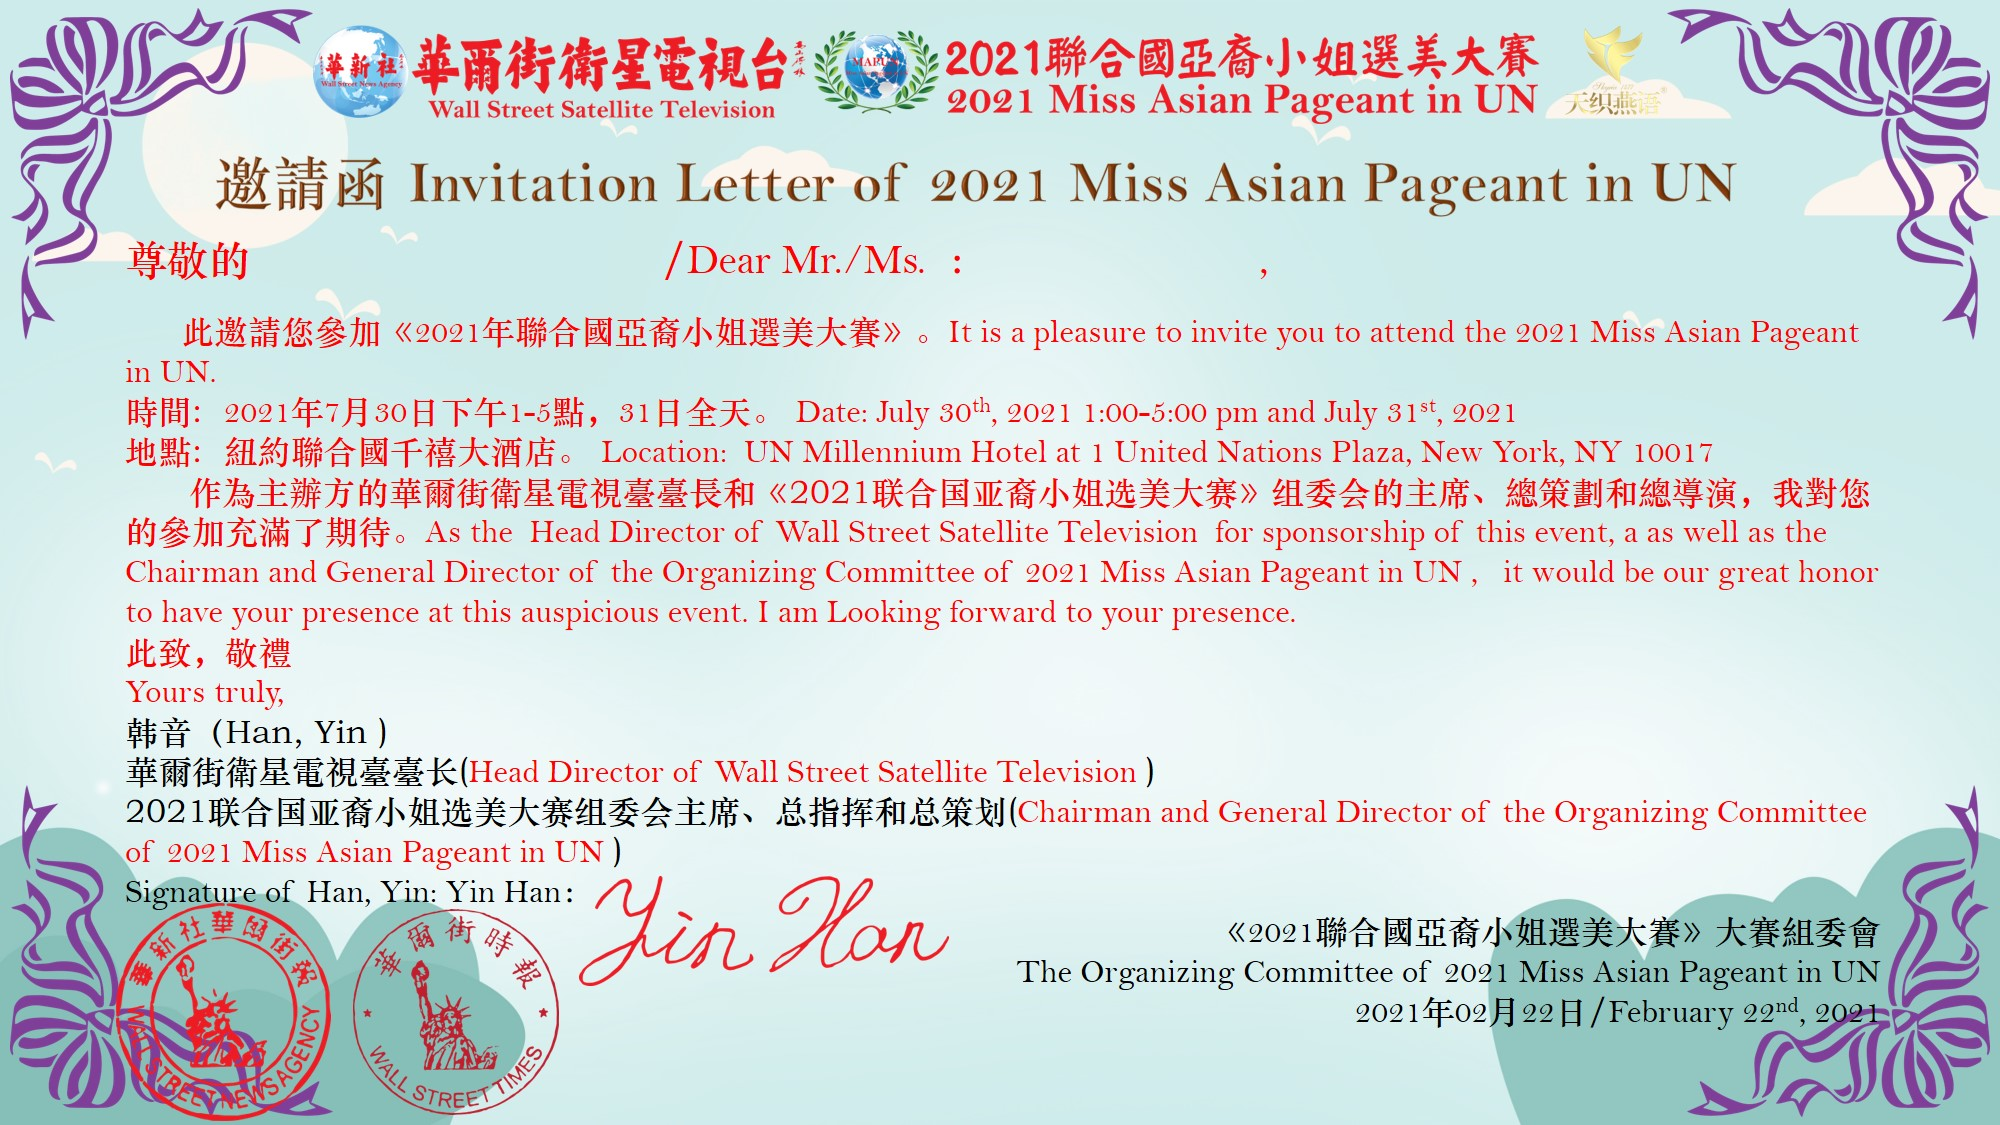 Han Yin of Invitation Letter 02